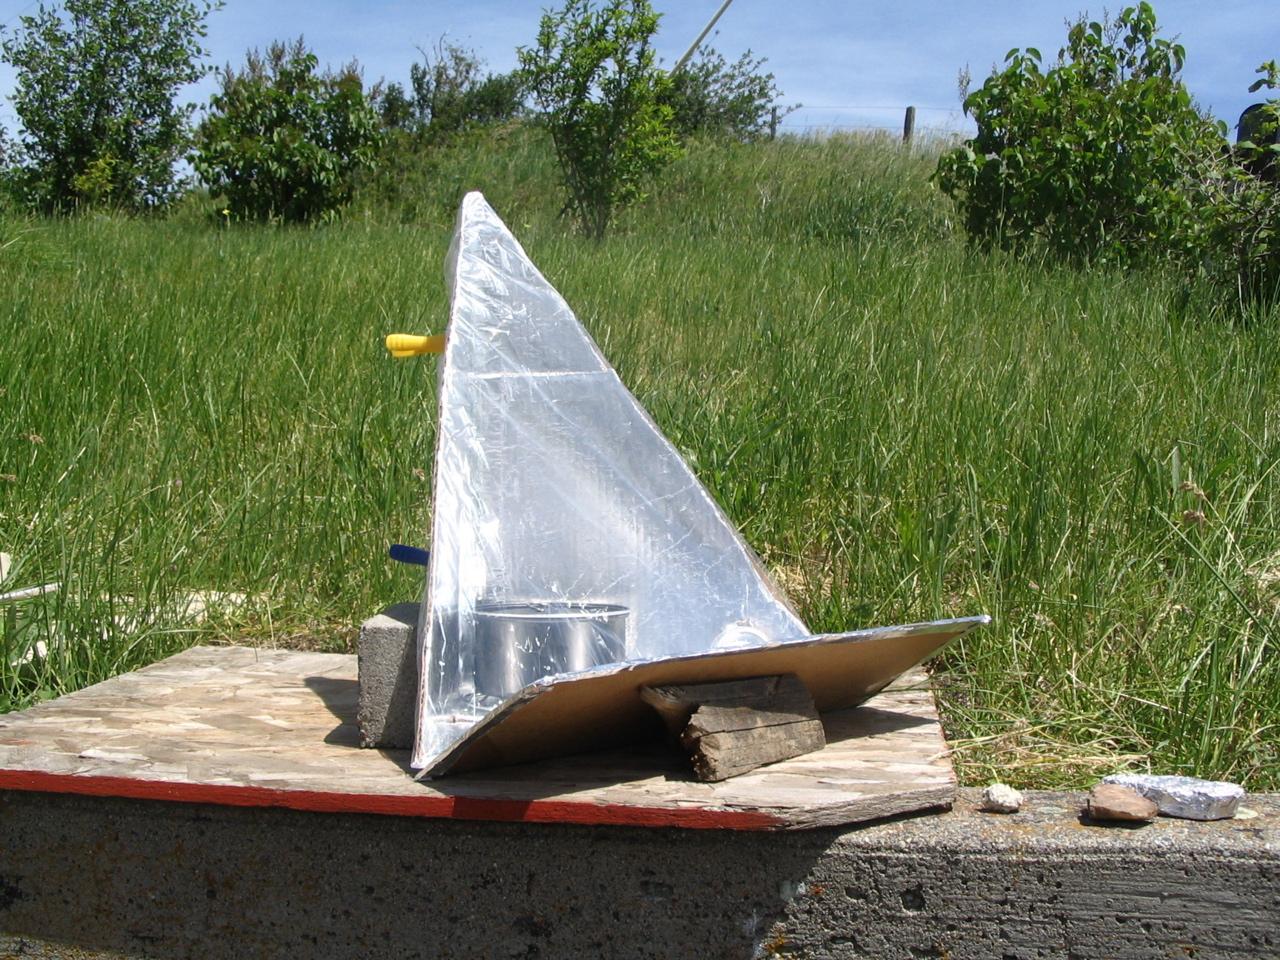 EZ-3 Solar Cooker